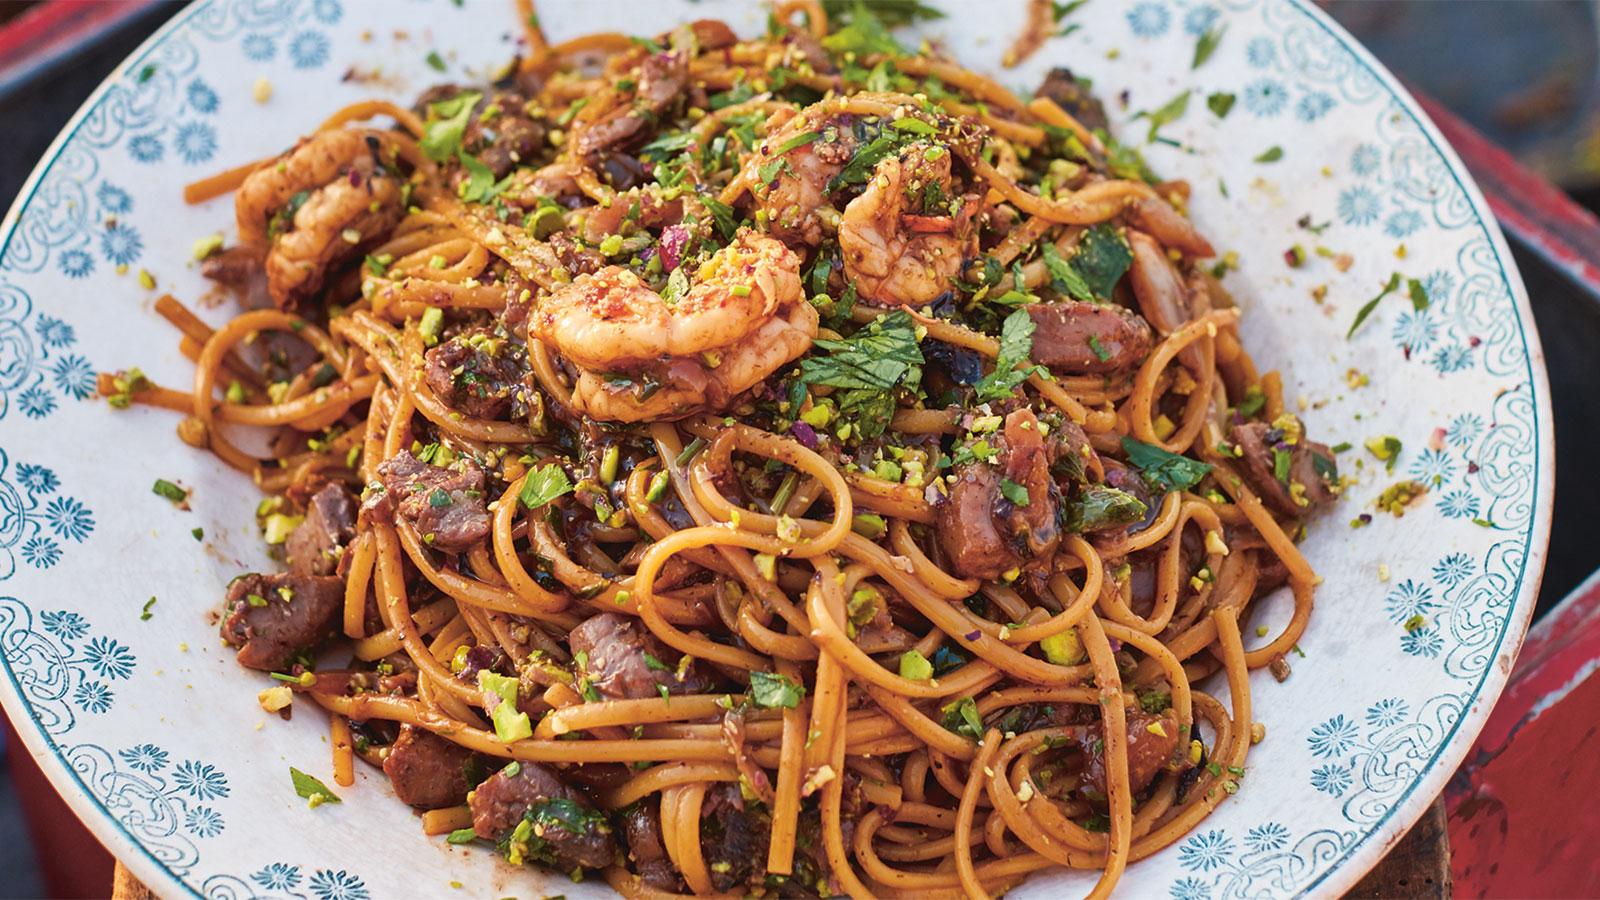 Linguine Con Gambas Y Atun Prawn Tuna Linguine Jamie Oliver Receta Canal Cocina